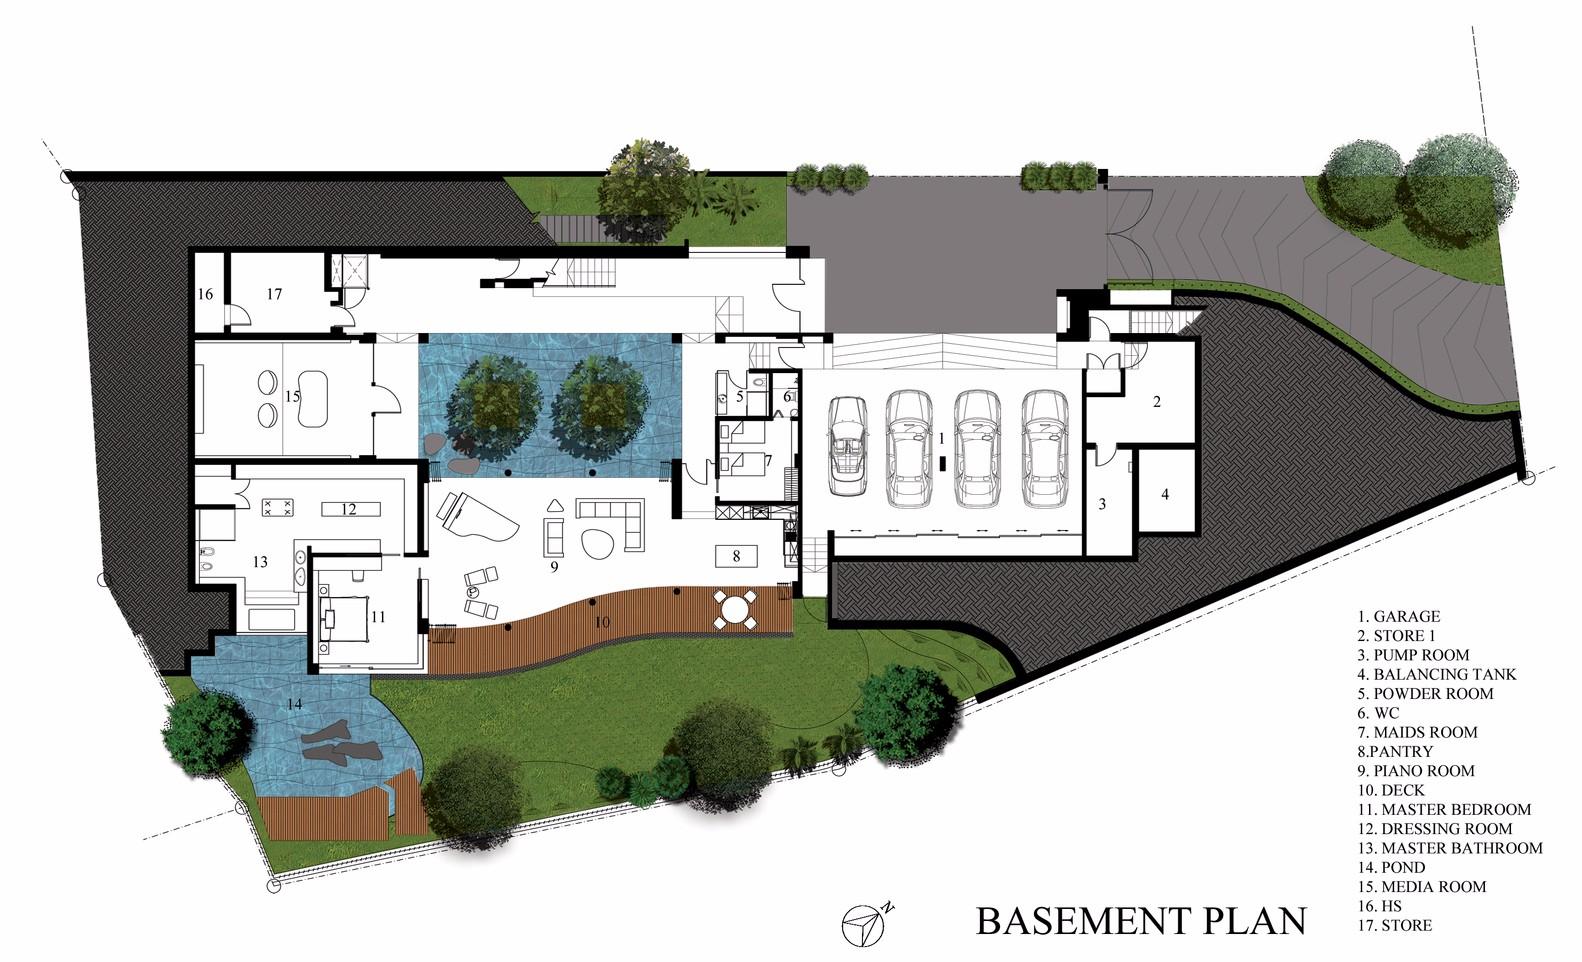 Dalvey_House_Basement_Plan.jpg